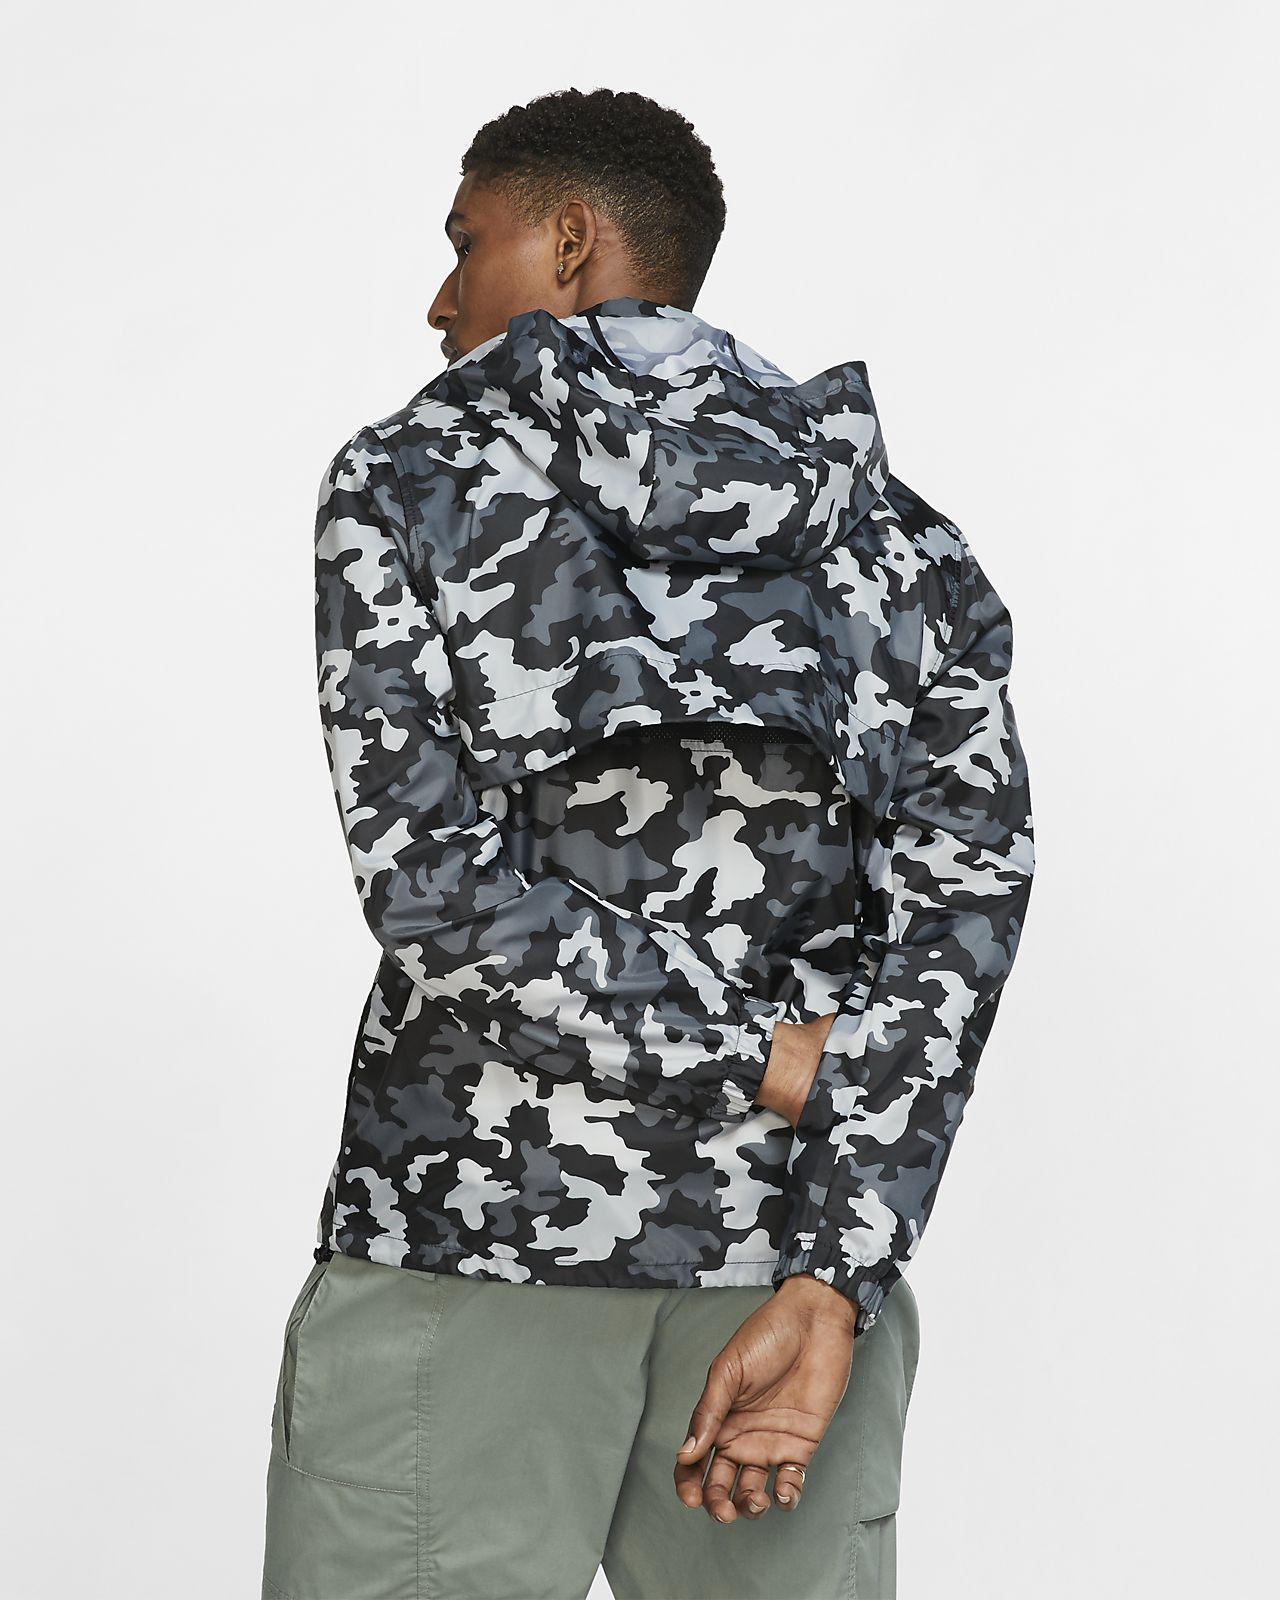 Nike Packable Camo Jackets   Men's & Women's